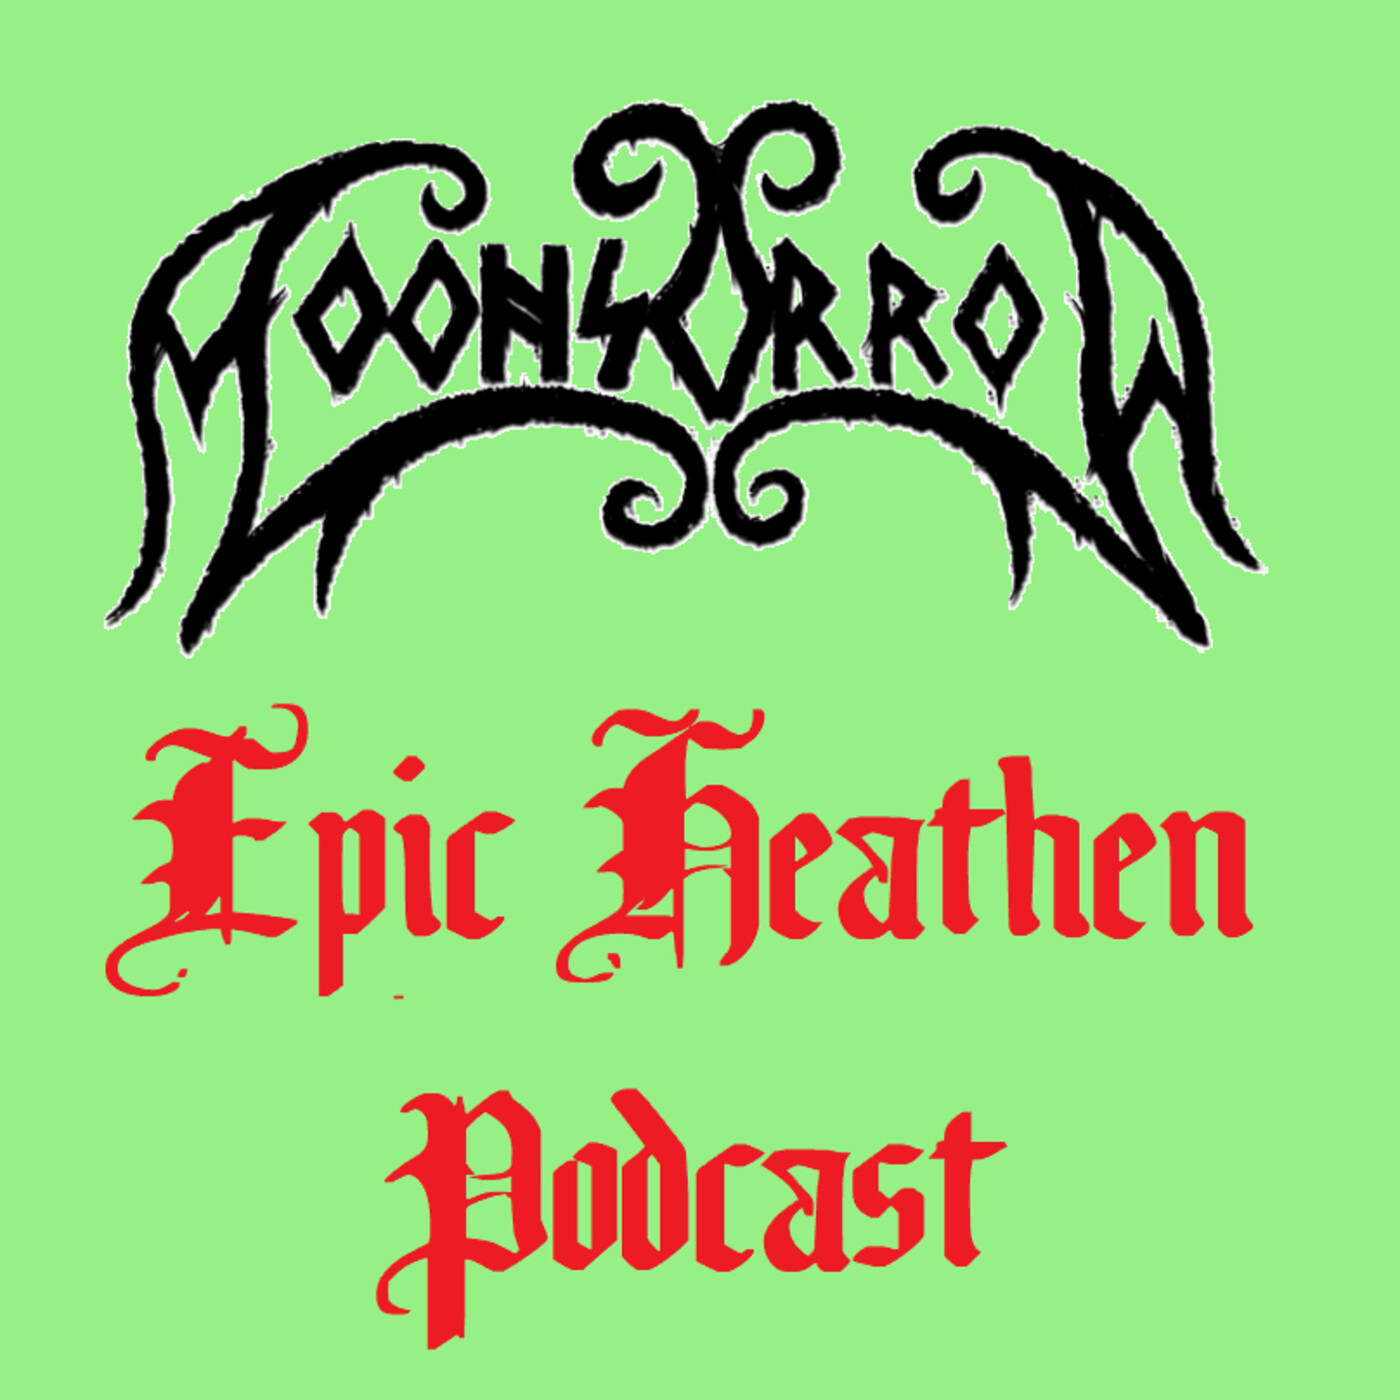 Episode 1: Suden uni, part 1 - Moonsorrow Talks: The Epic Heathen Podcast